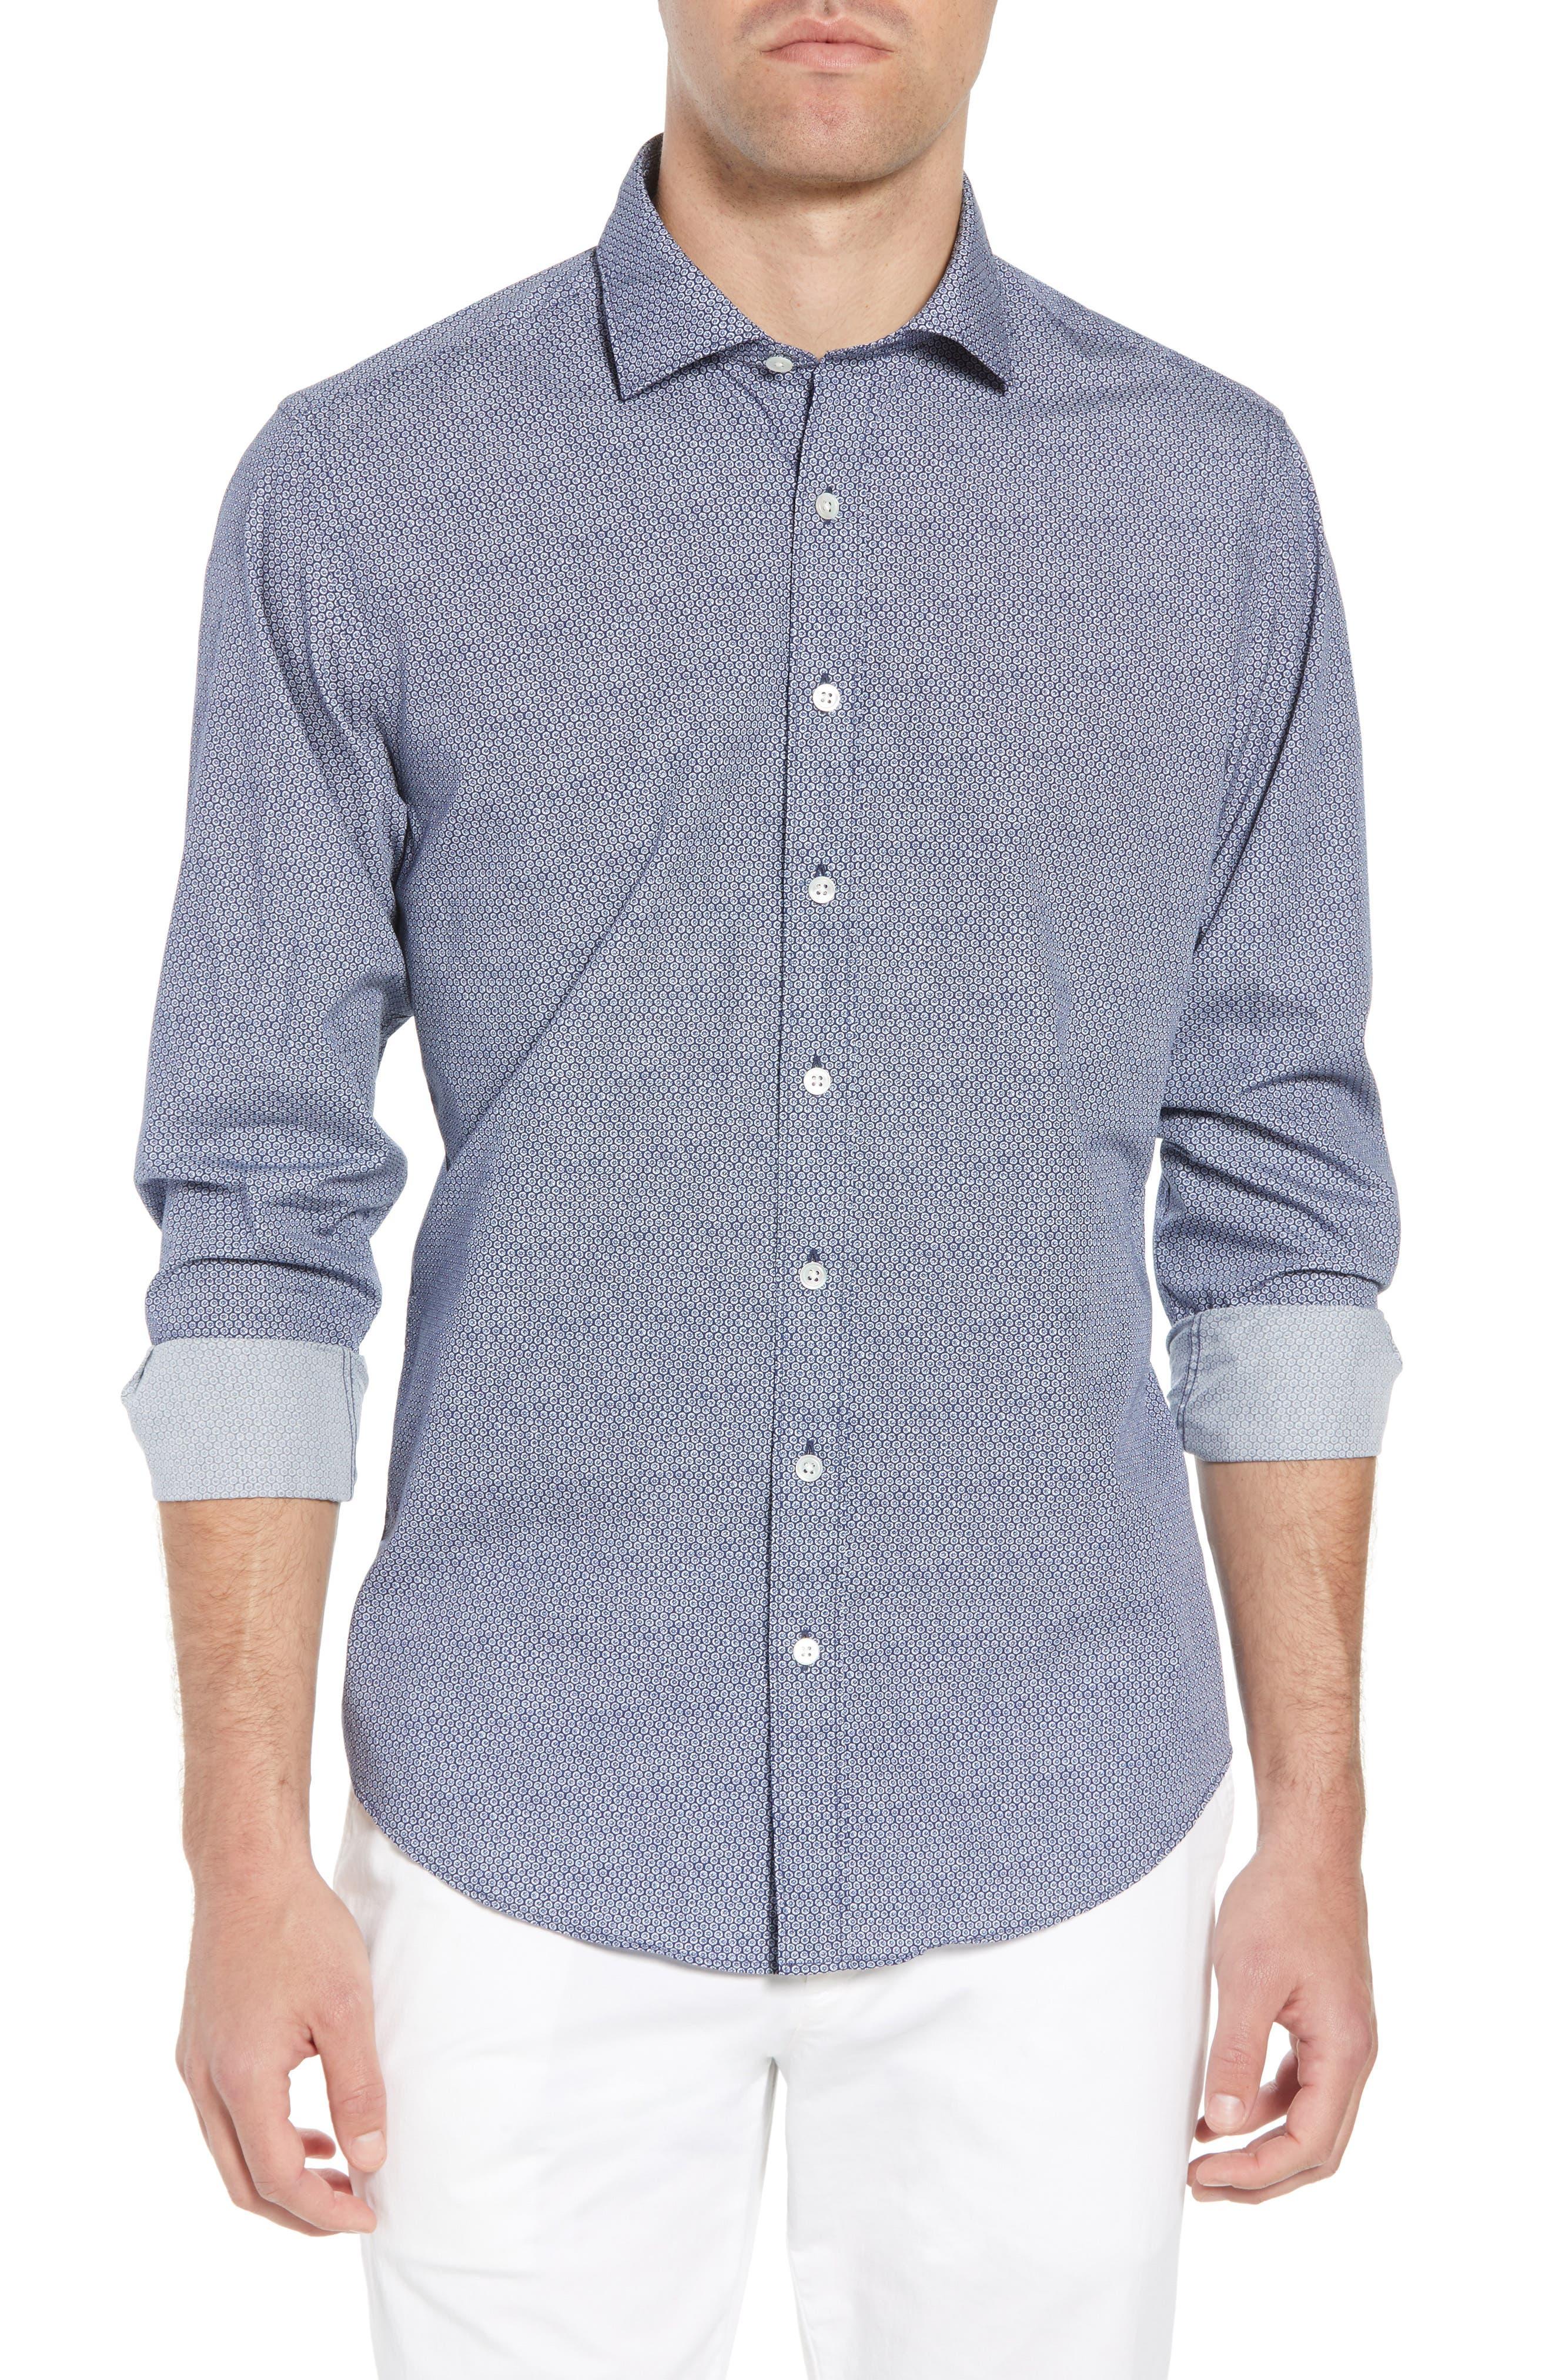 Beacon Point Regular Fit Sport Shirt,                             Main thumbnail 1, color,                             410